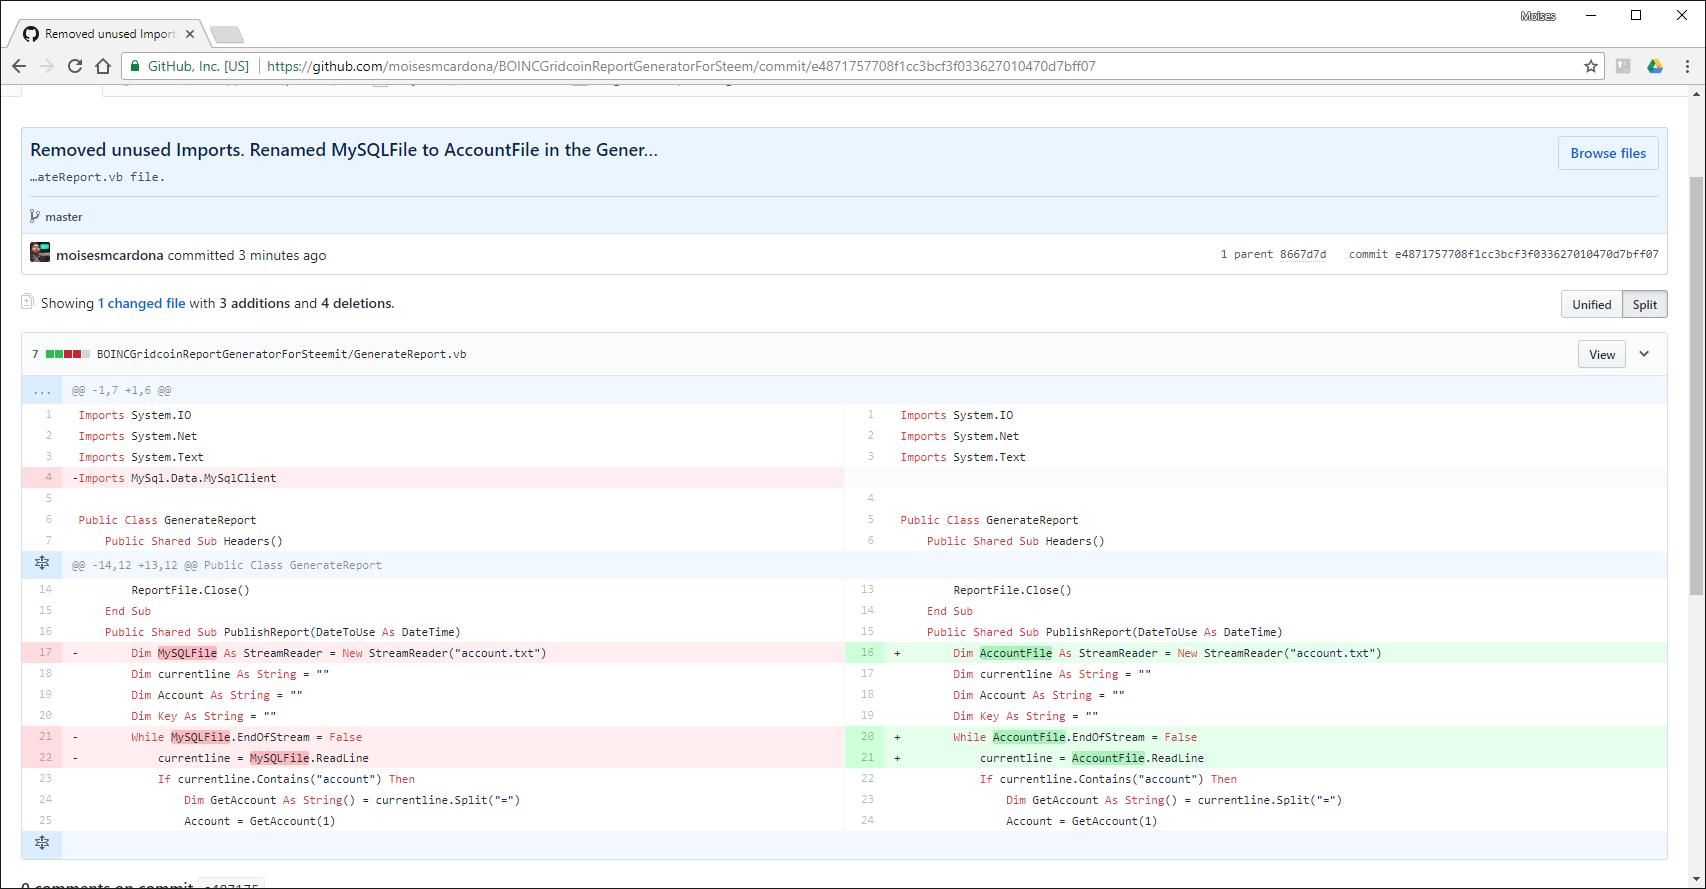 Gridcoin bug fix